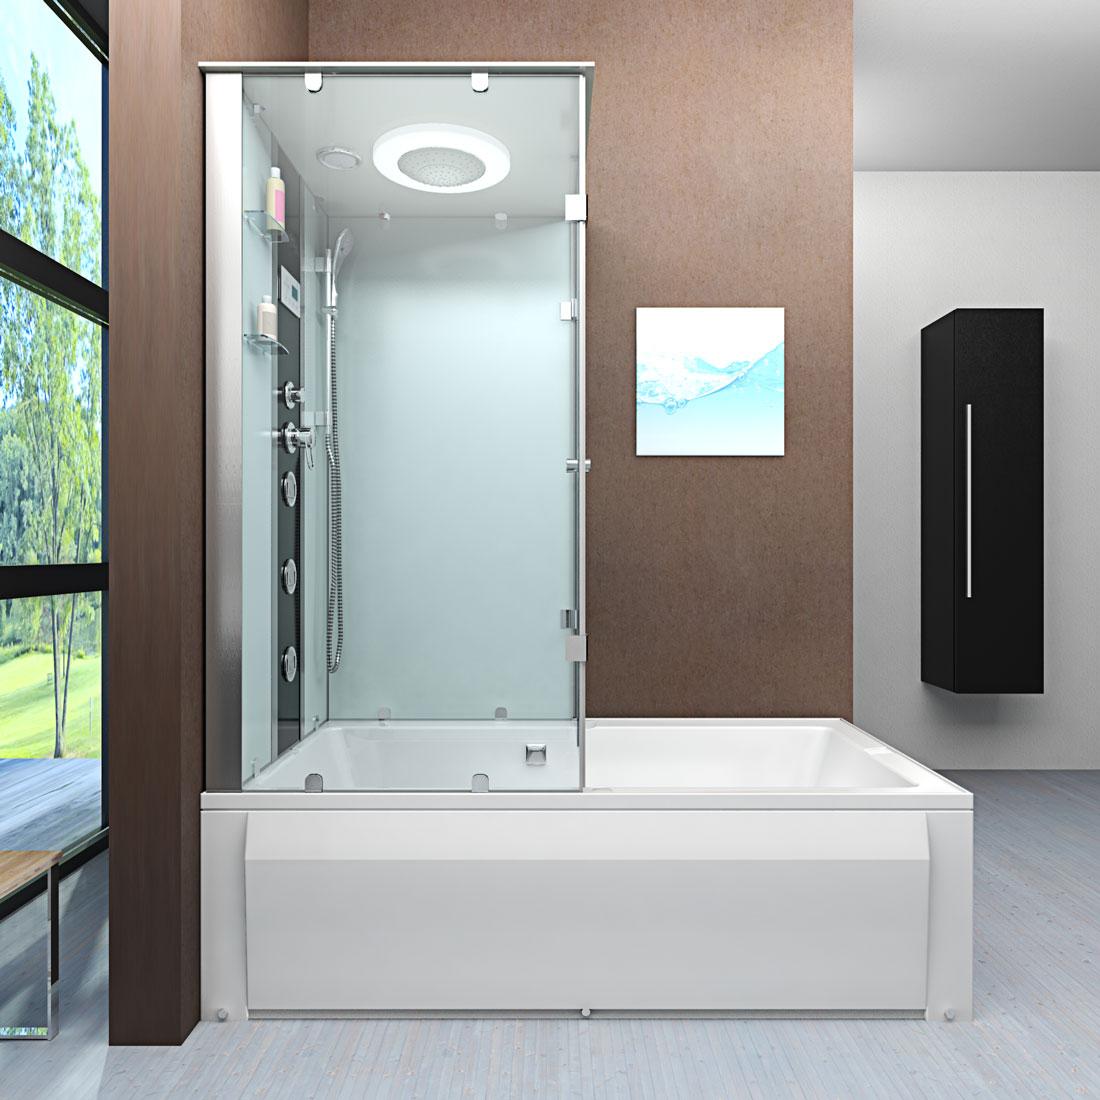 acquavapore dtp50 a001r dusch wannen kombi in 90x180cm trendbad24. Black Bedroom Furniture Sets. Home Design Ideas